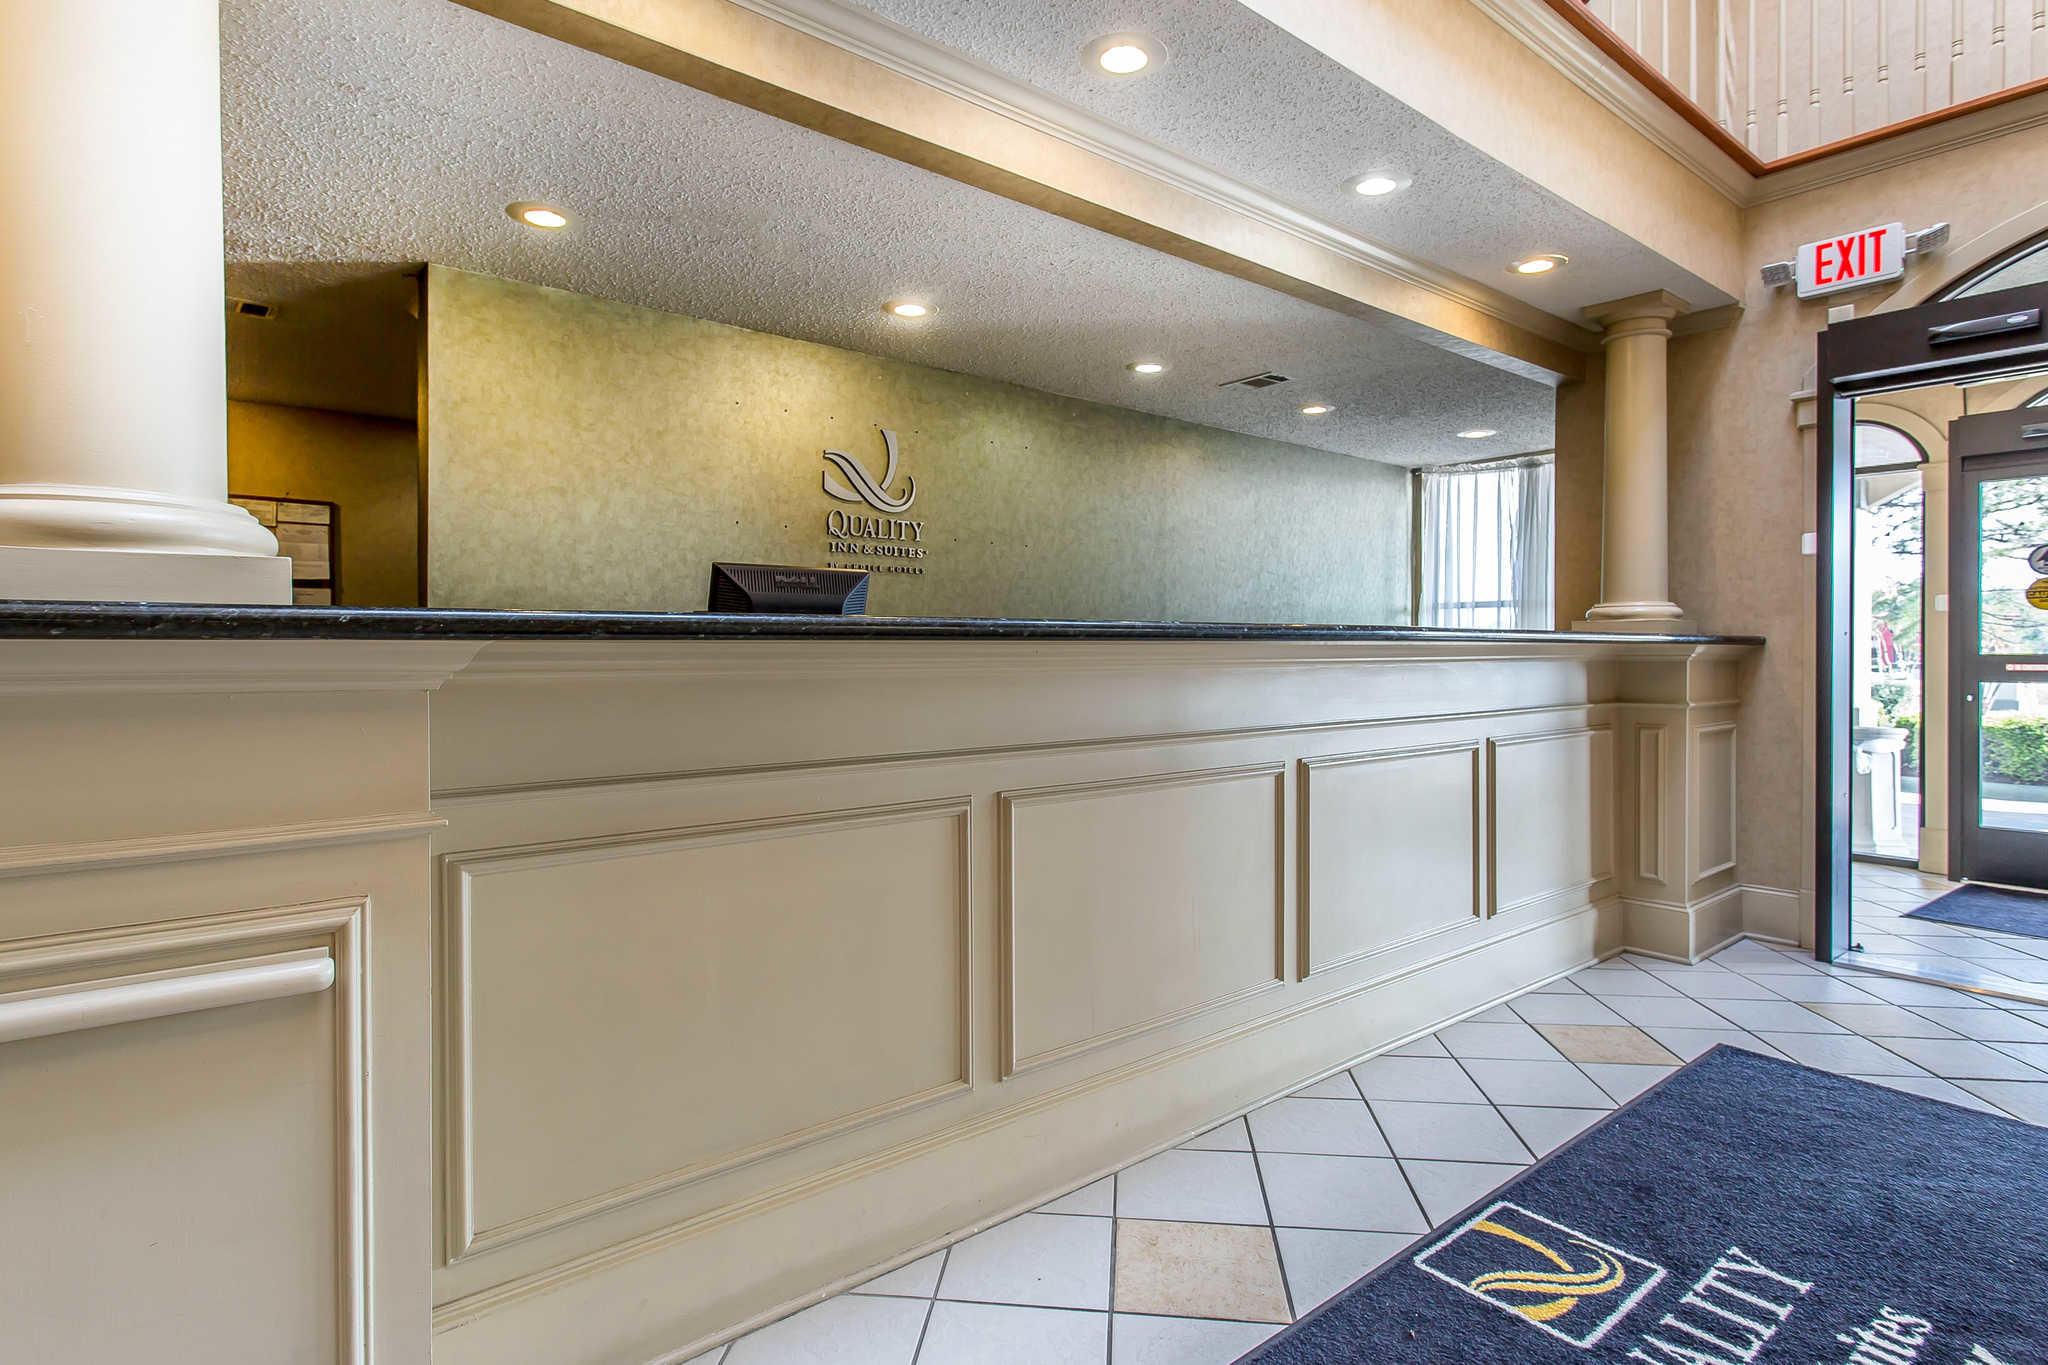 Quality Inn & Suites Durant image 7